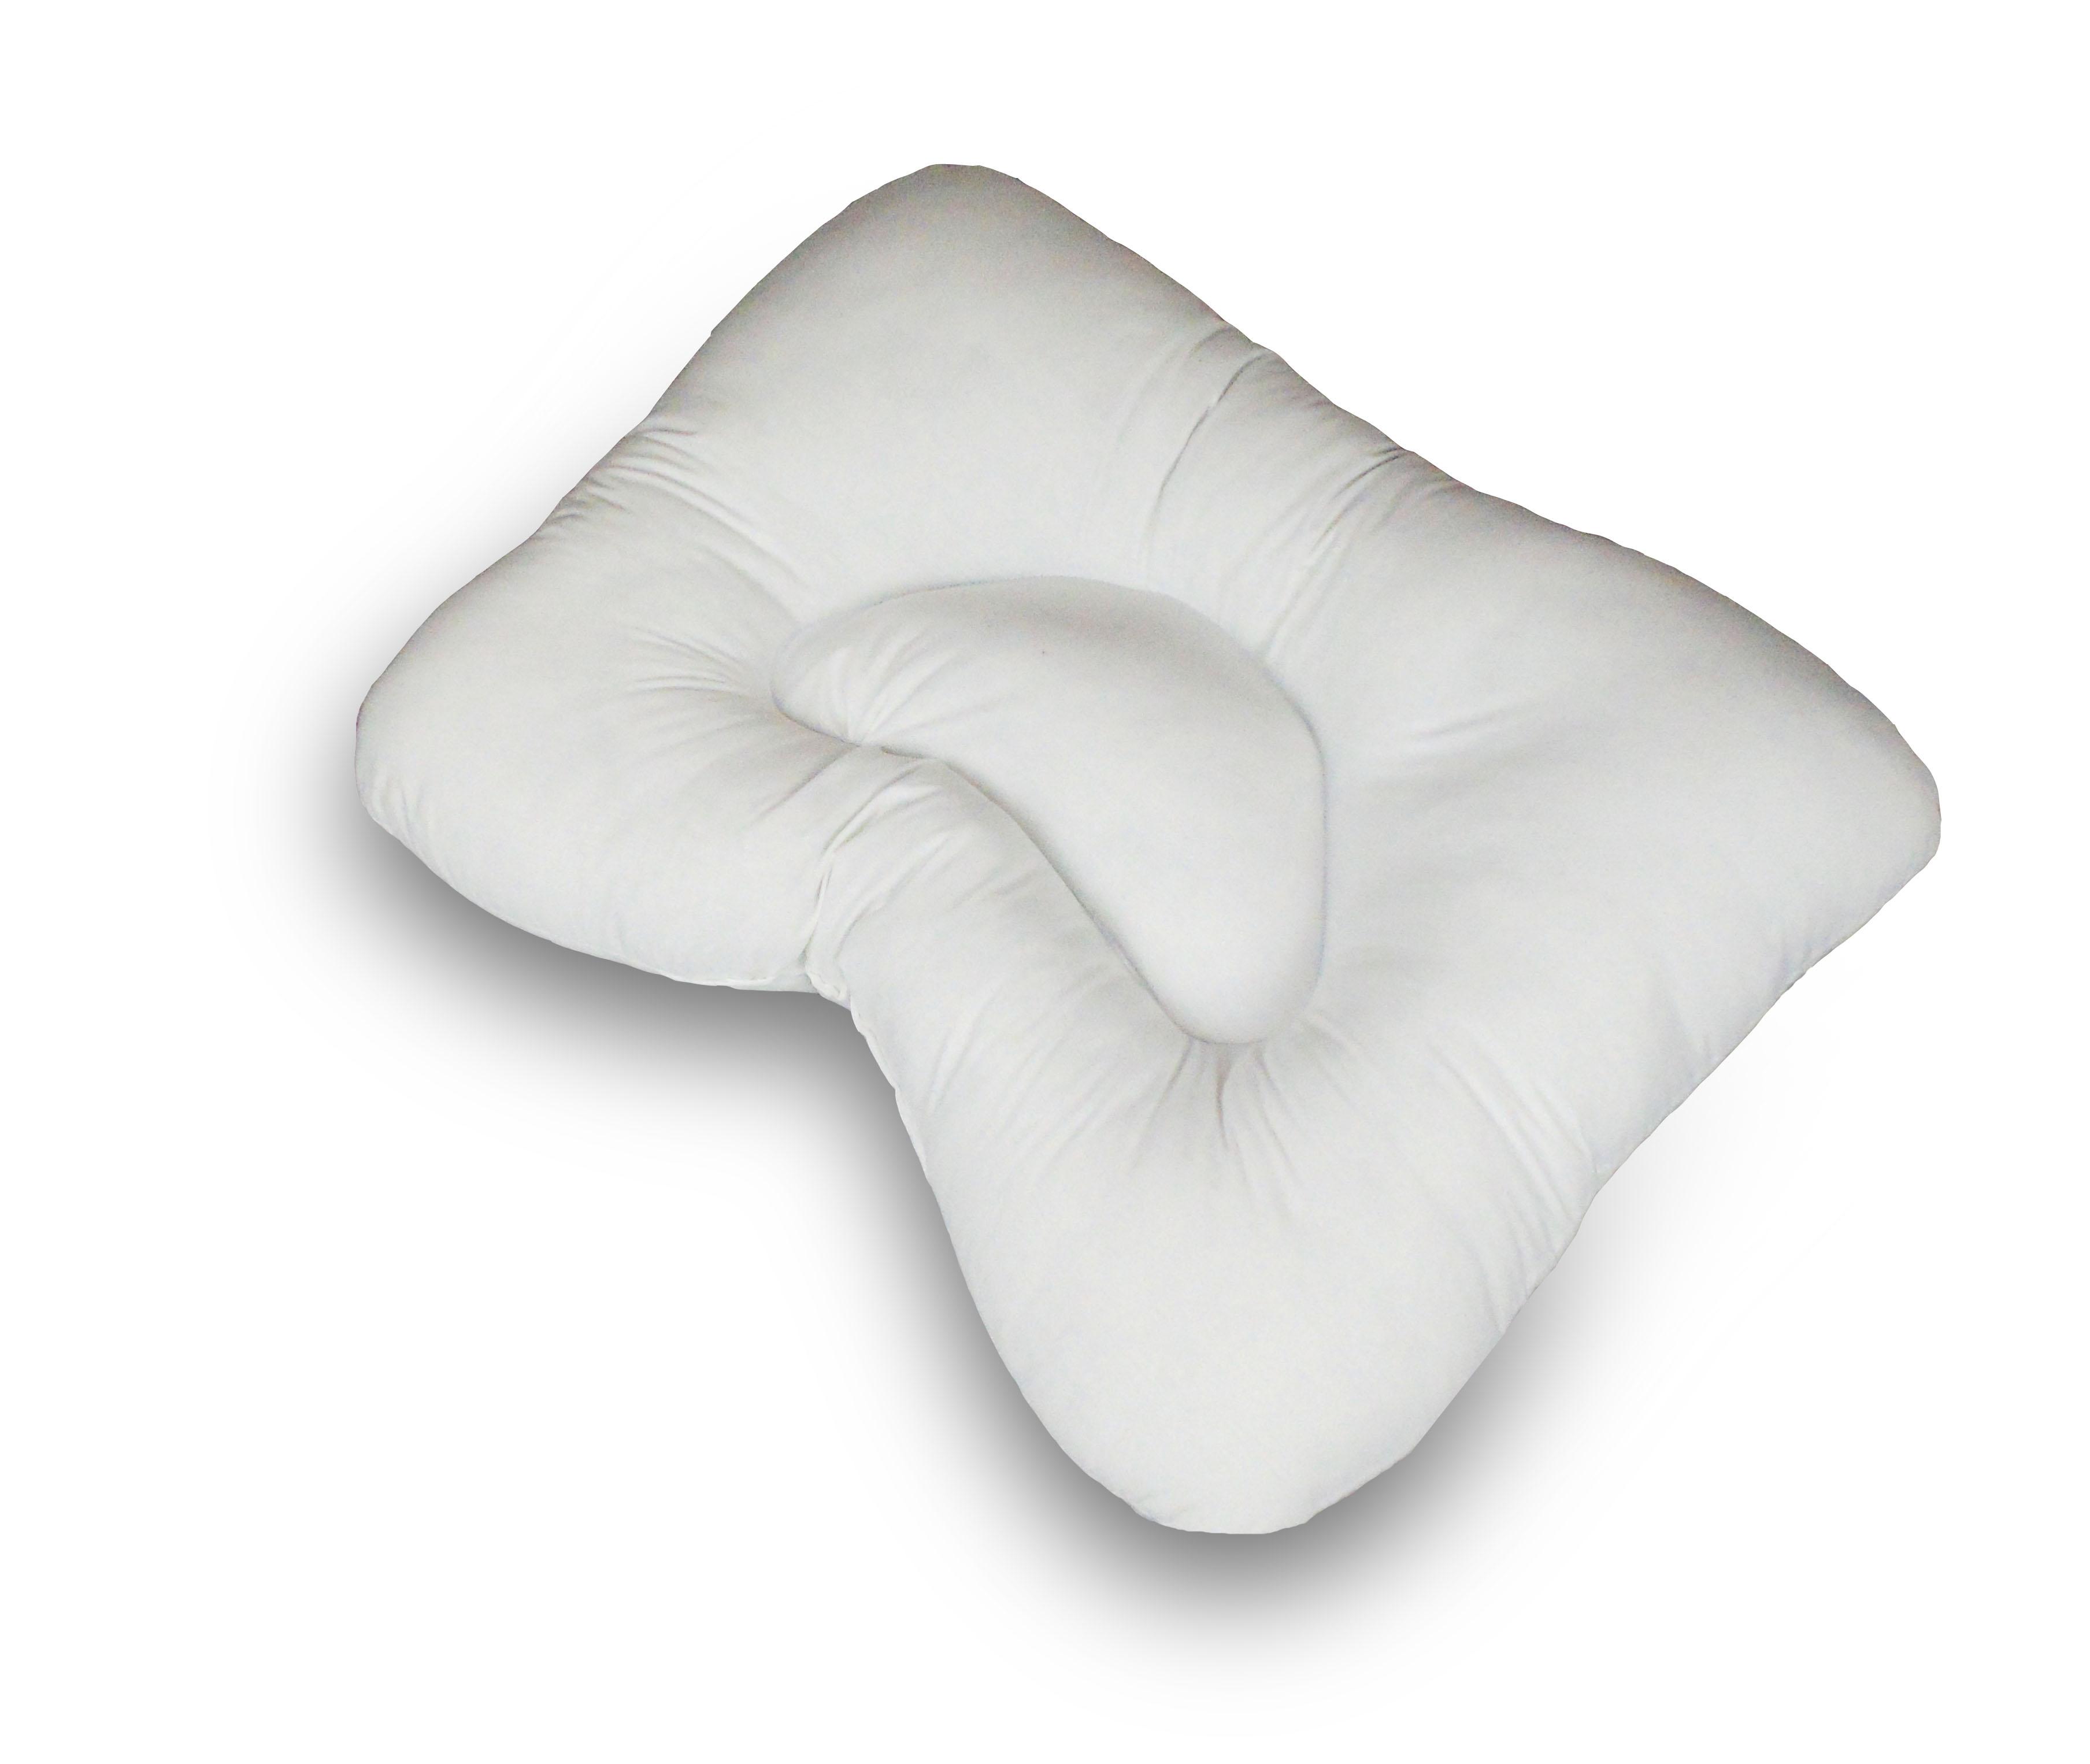 Cervical Neck Support Pillow